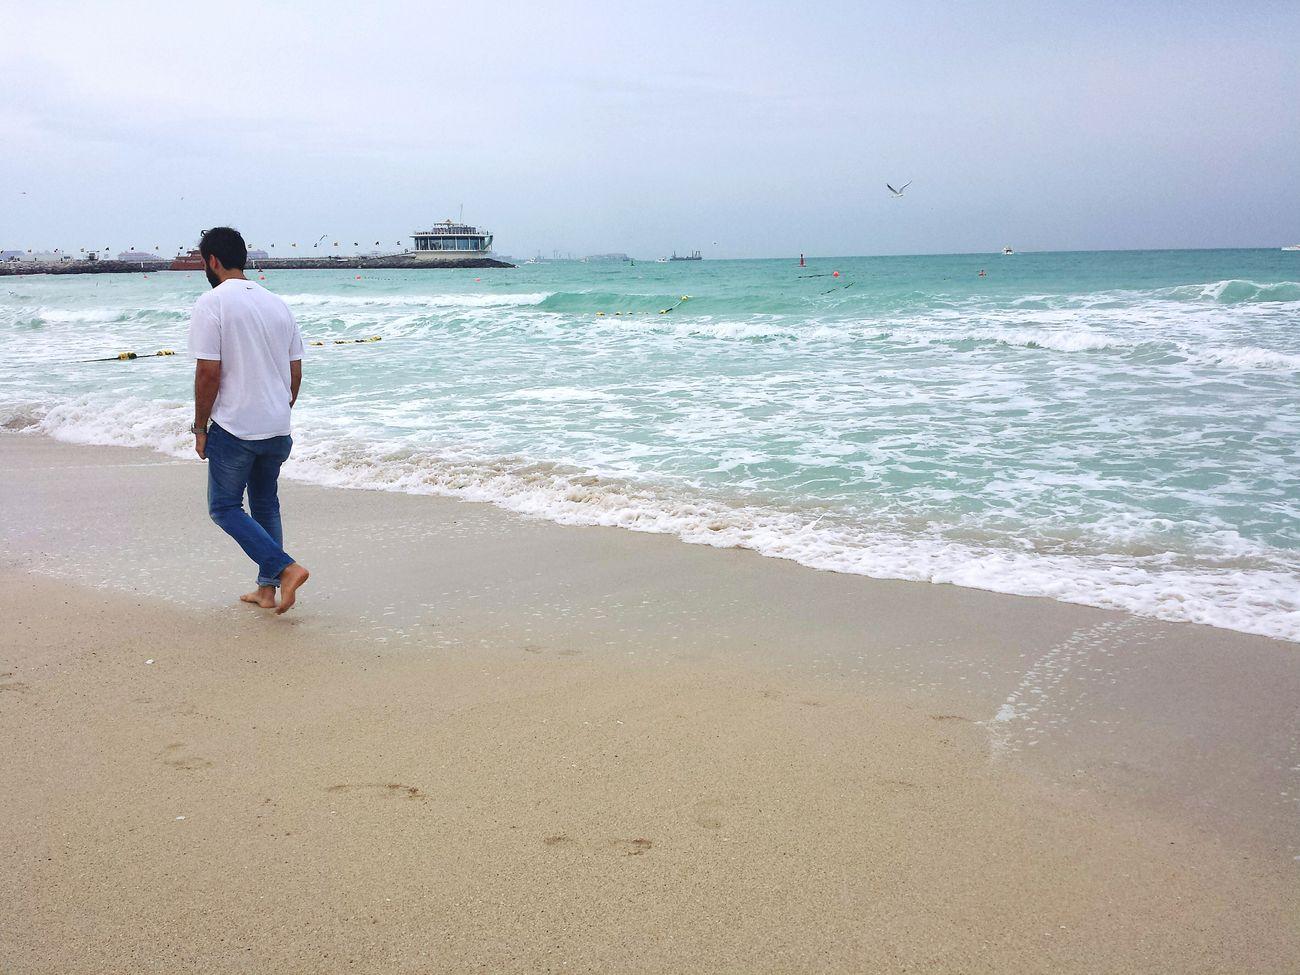 Dubai Uae #dubai #sharjah #ajman #rak #fujairah #alain #abudhabi #ummalquwain #instagood #instamood #instalike #mydubai #myuae #dubaigems #emirates #dxb Myabudhabi Shj Insharjah Qatar Oman Bahrain Kuwait Ksa [ [a:908] Seaside Jumeira Jumeirahbeach Jumeirahbeachresidence UAE Open Edit Popular Hello World Dubailife Vscocam VSCO Samsung Galaxy S4 Photo Of The Day First Eyeem Photo EyeEm Best Shots - People + Portrait People Capture The Moment Getting Inspired EyeEm Gallery Colors Seashore The Blue Wave Marina Beach, Dubai